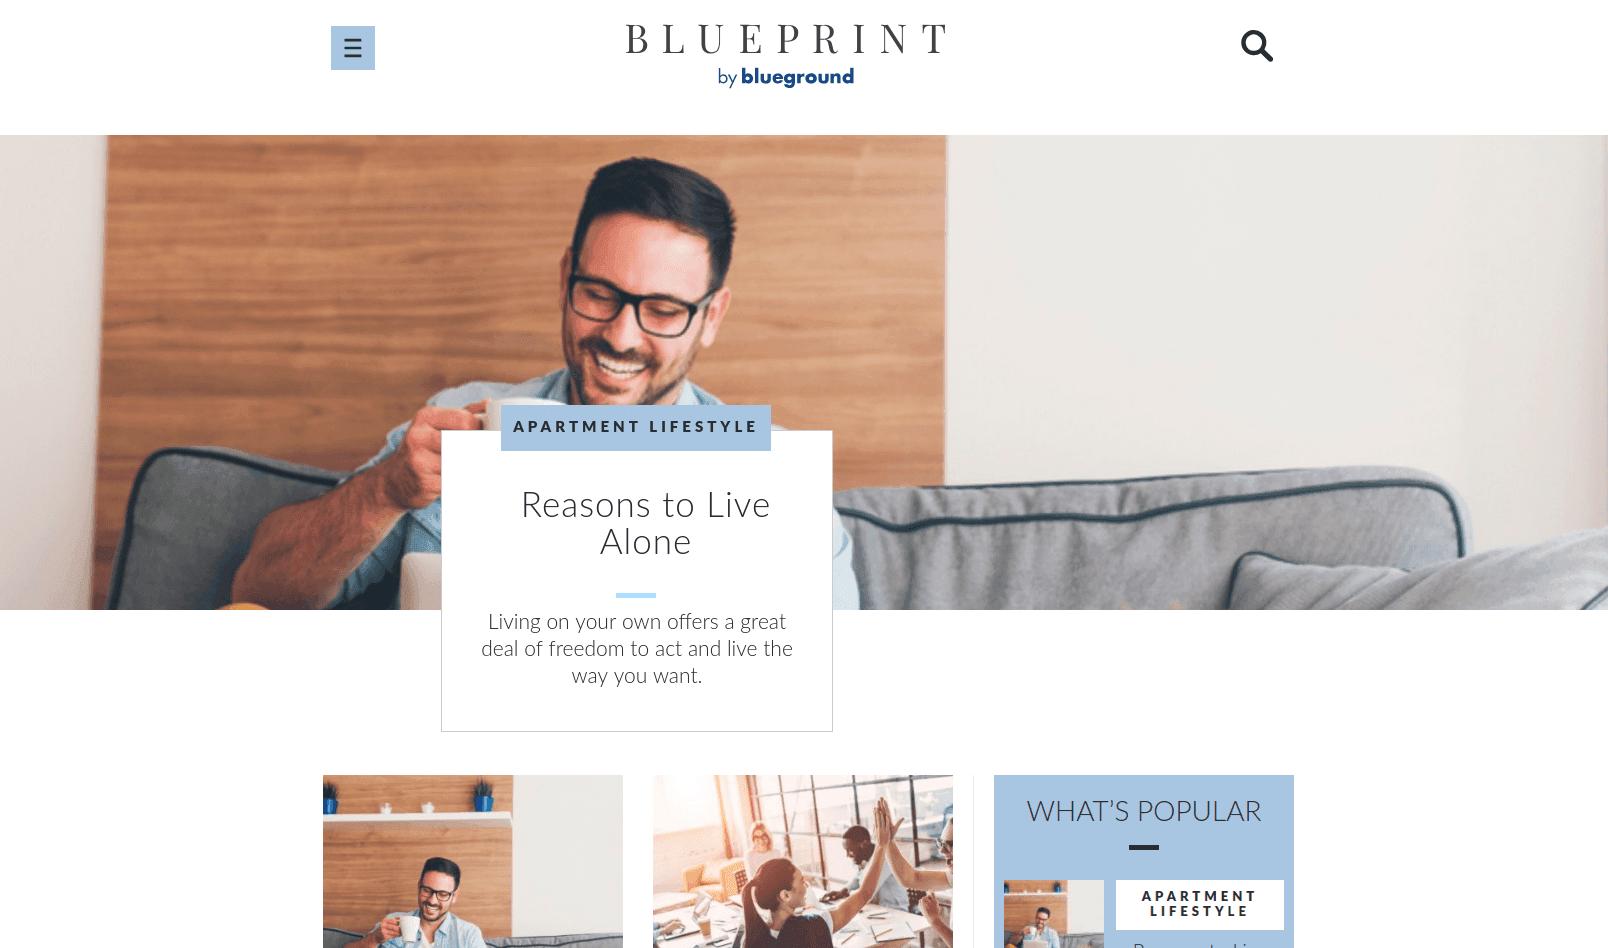 infinityweb-blueprint-blueground